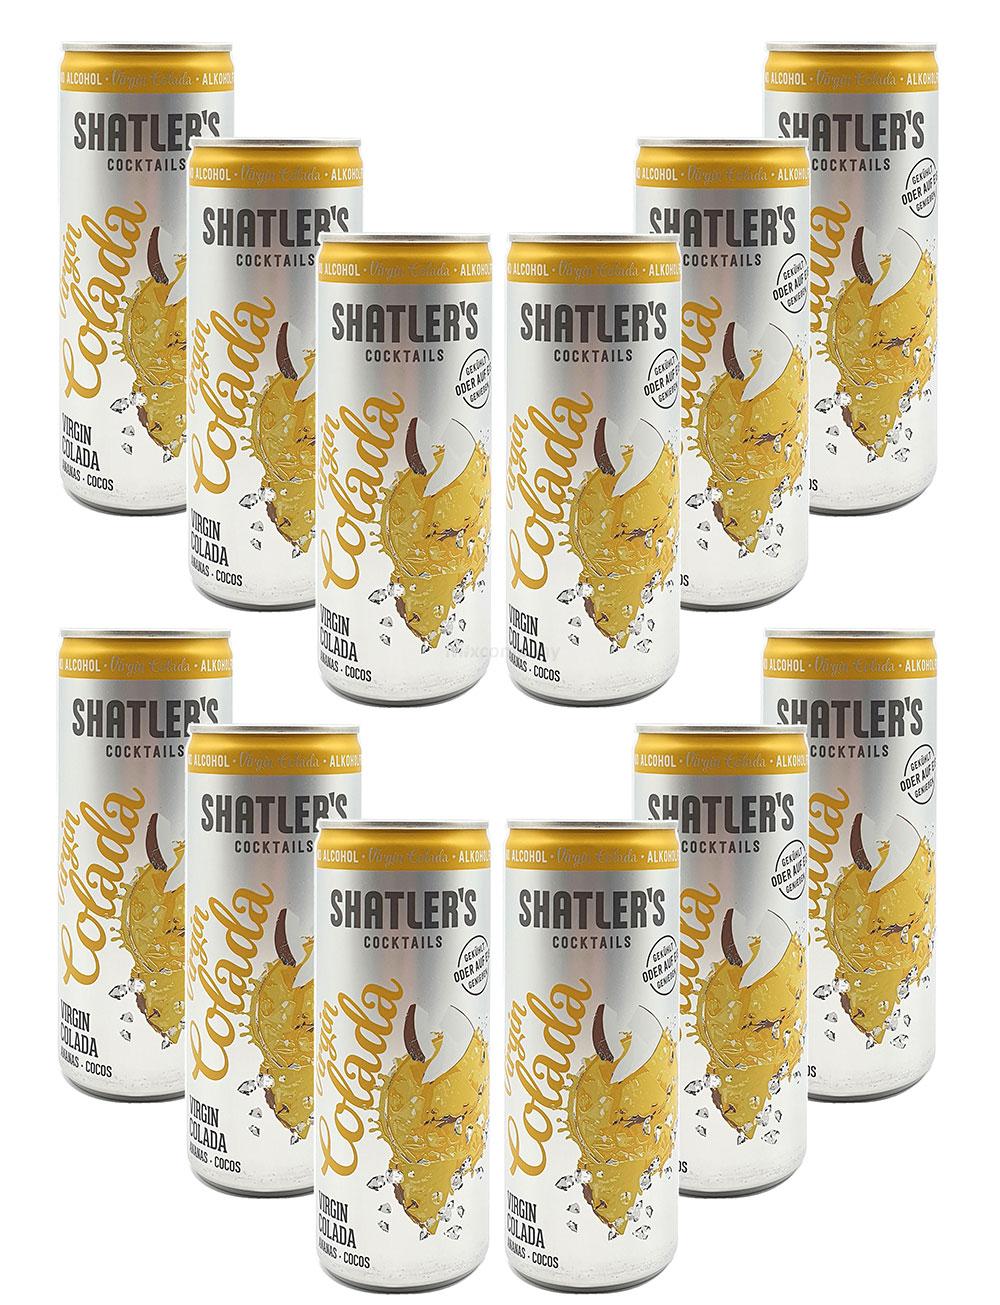 Shatlers Cocktail - 12er Set Shatlers Virgin Colada 0,25L Alkoholfrei - inklusive Pfand EINWEG - Shatlers Cocktail - Ready to Go